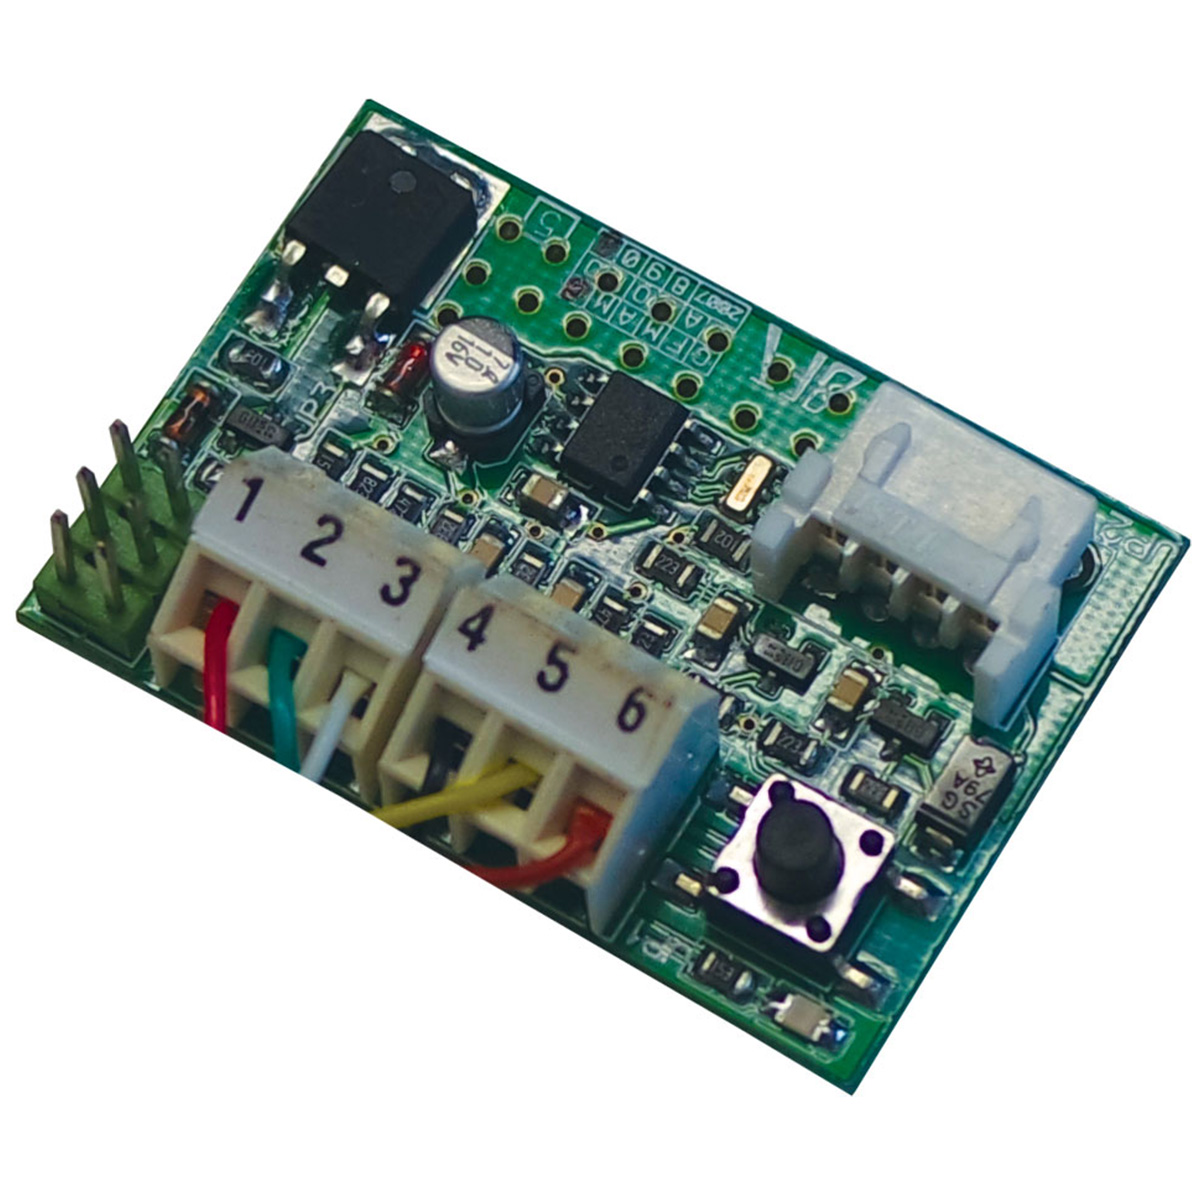 BFT Adapterplatine für Q.BO PAD / Compass Slim B-EBA WIE DRIVER